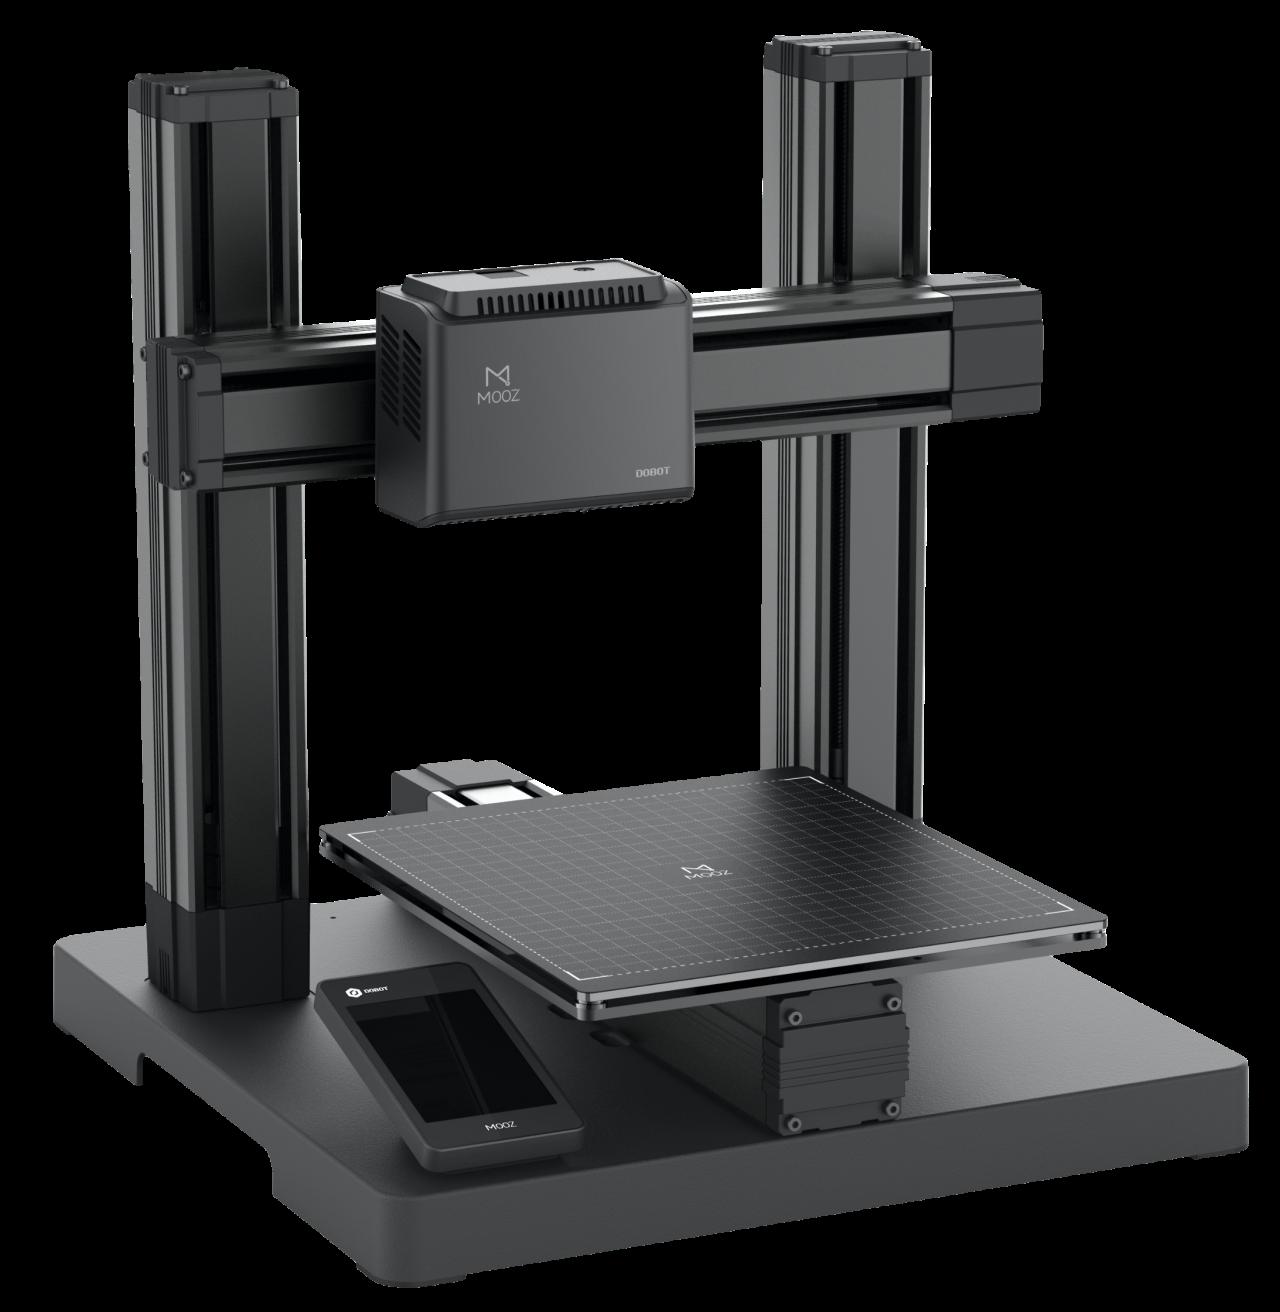 Dobot MOOZ 3DF Plus